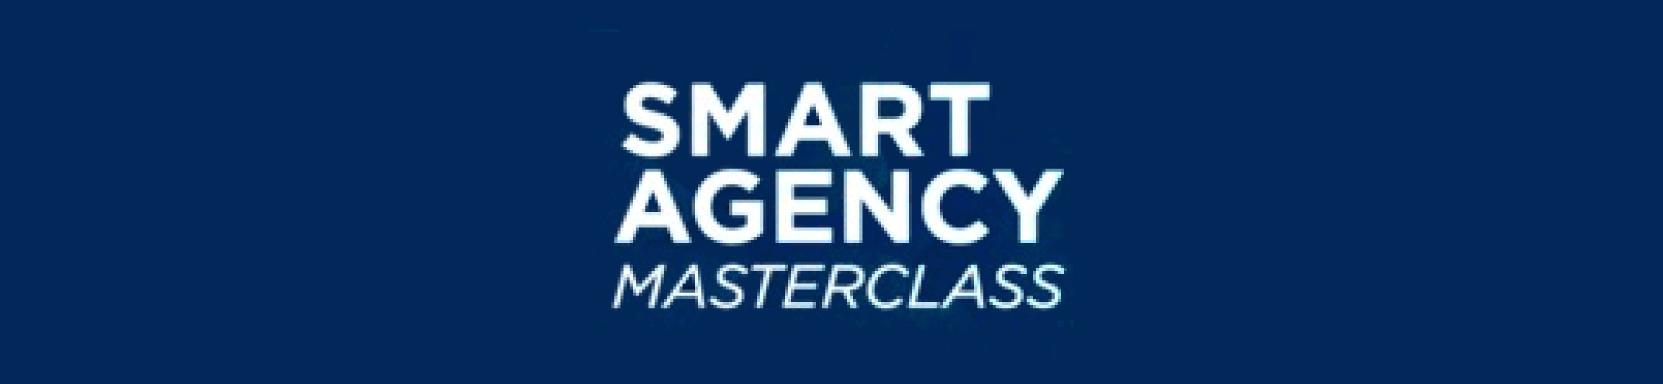 Smart Agency Masterclass Podcast